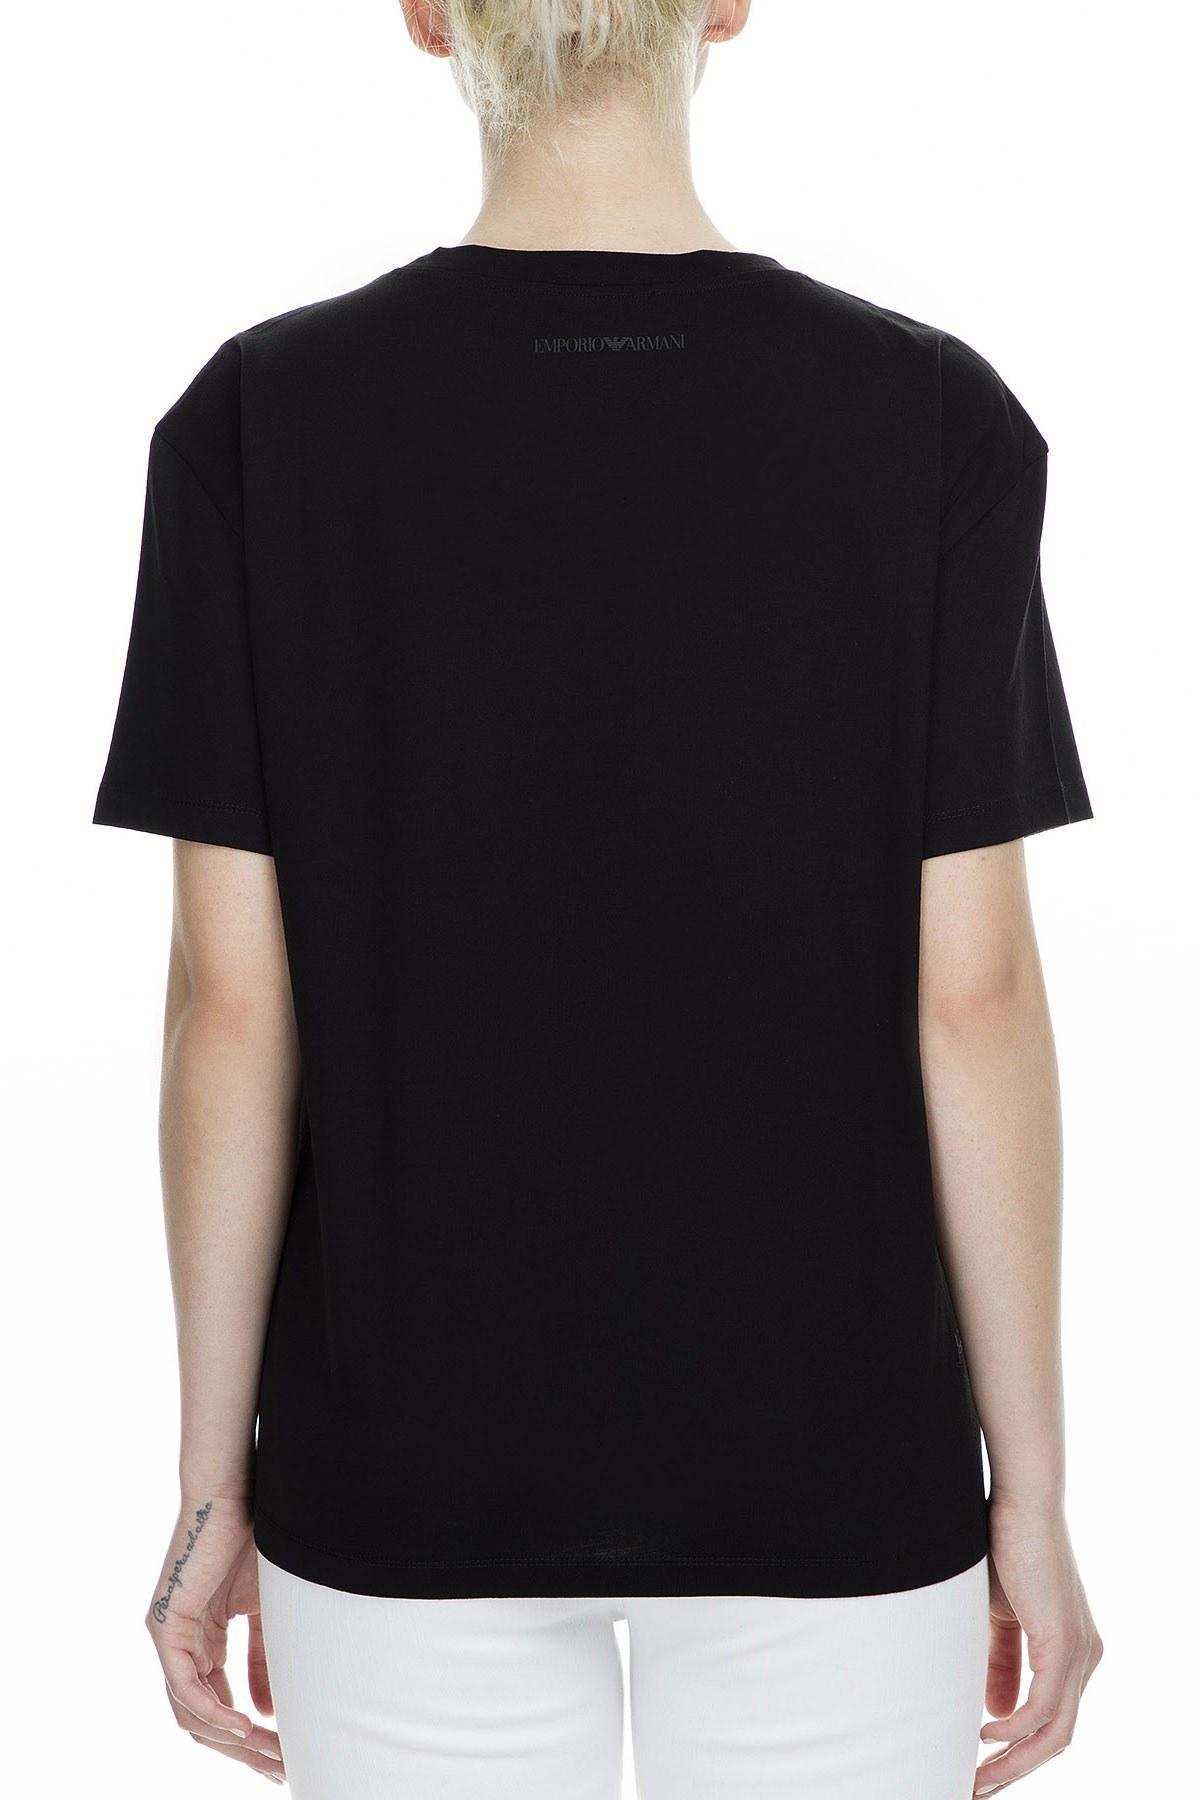 Emporio Armani Regular Fit Kadın T Shirt 6G2T7M 2J95Z 0999